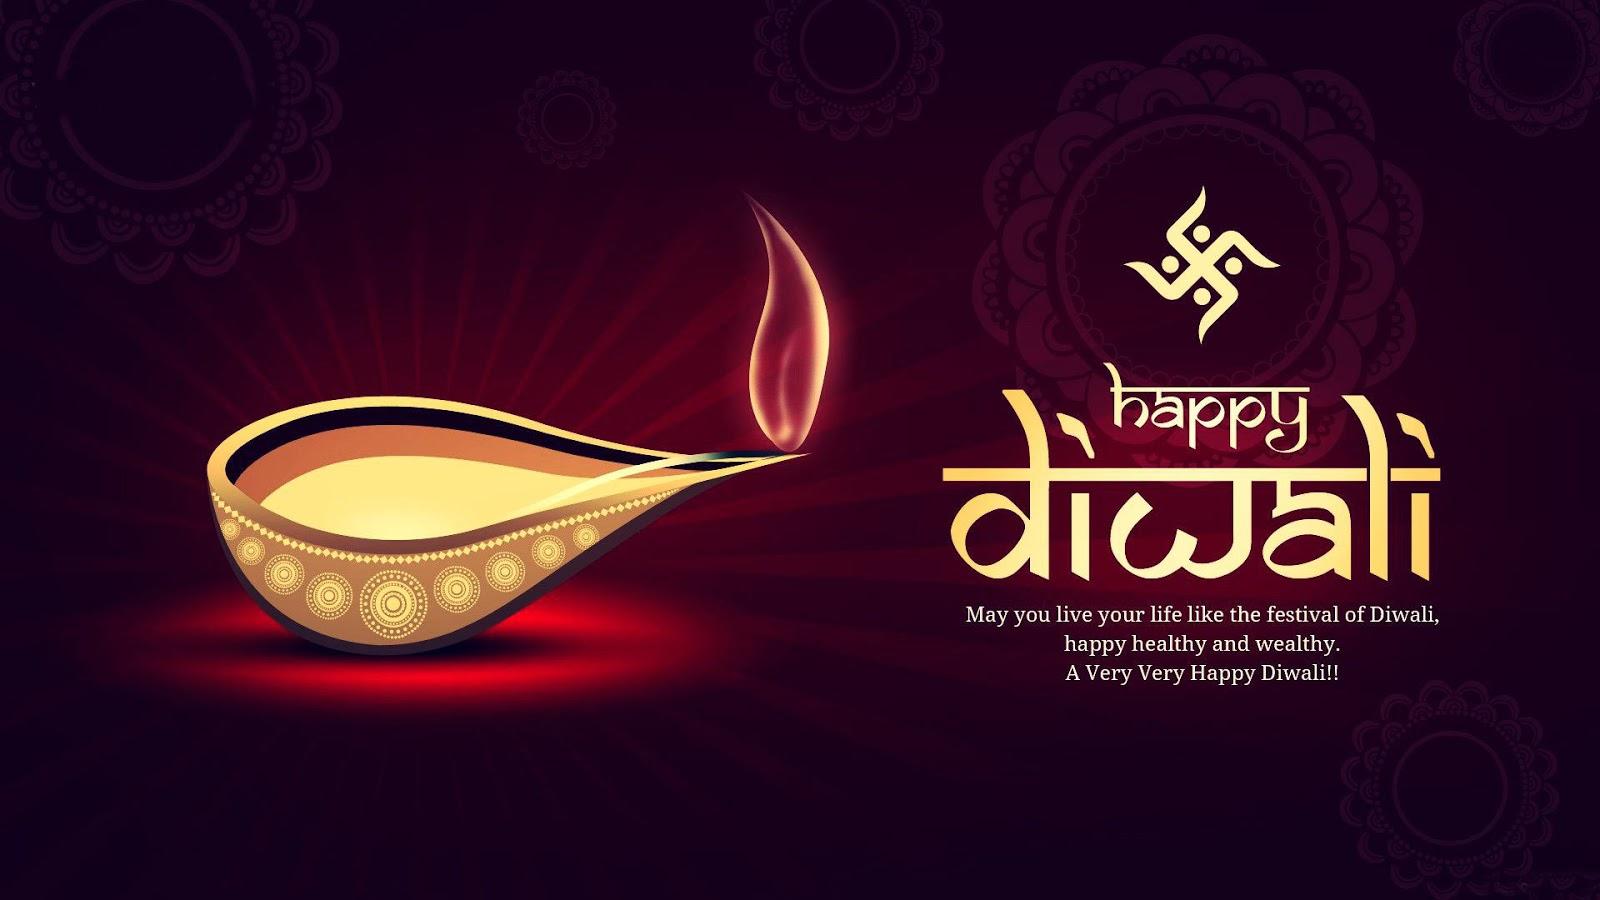 Diwali 2017 Happy Diwali Wishesmessages And Diwali Greetings